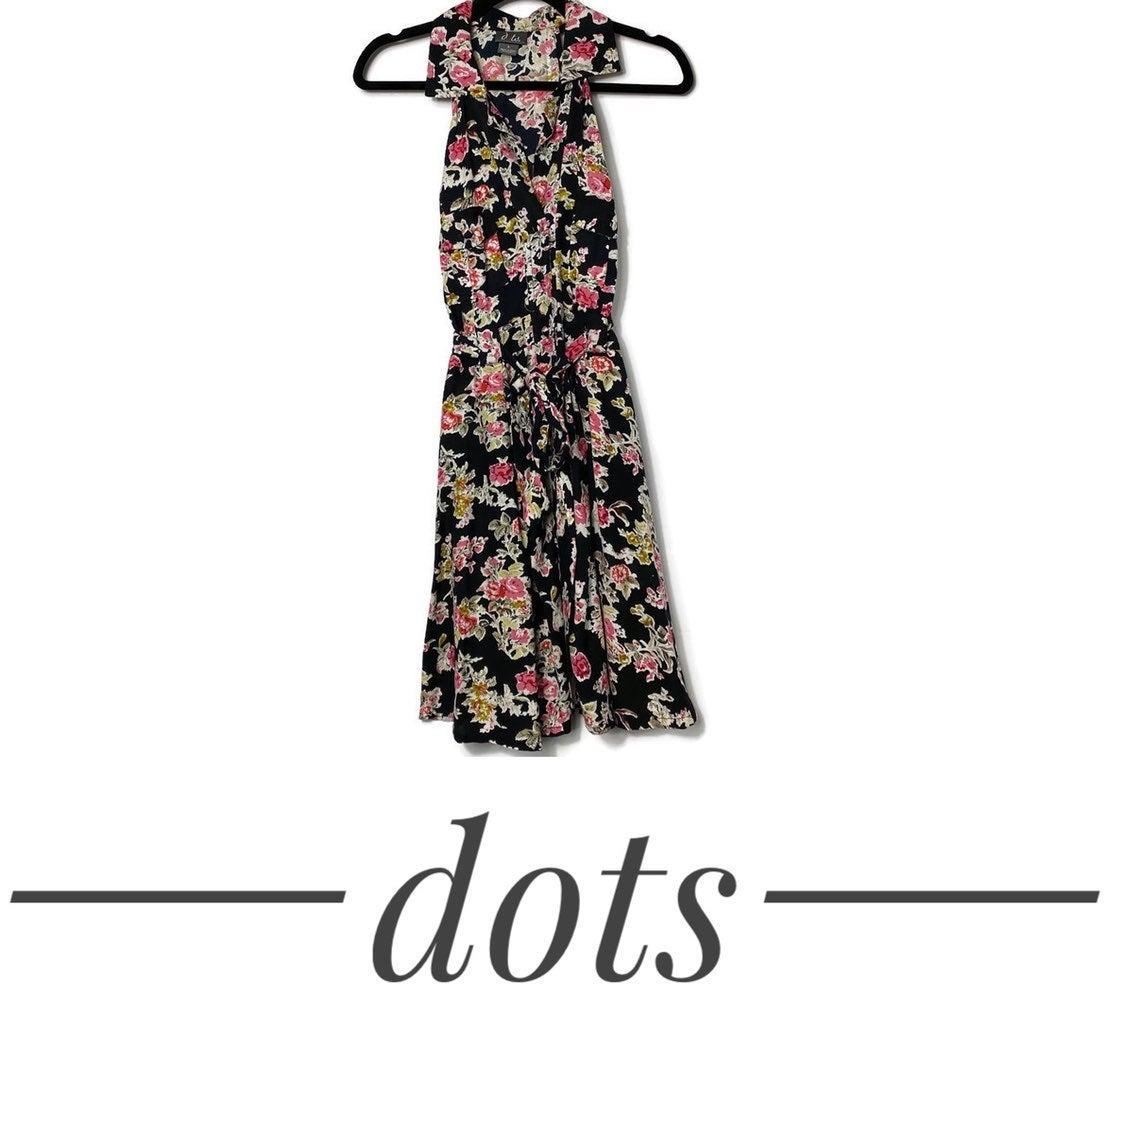 dots Floral Sleeveless Button Down Dress